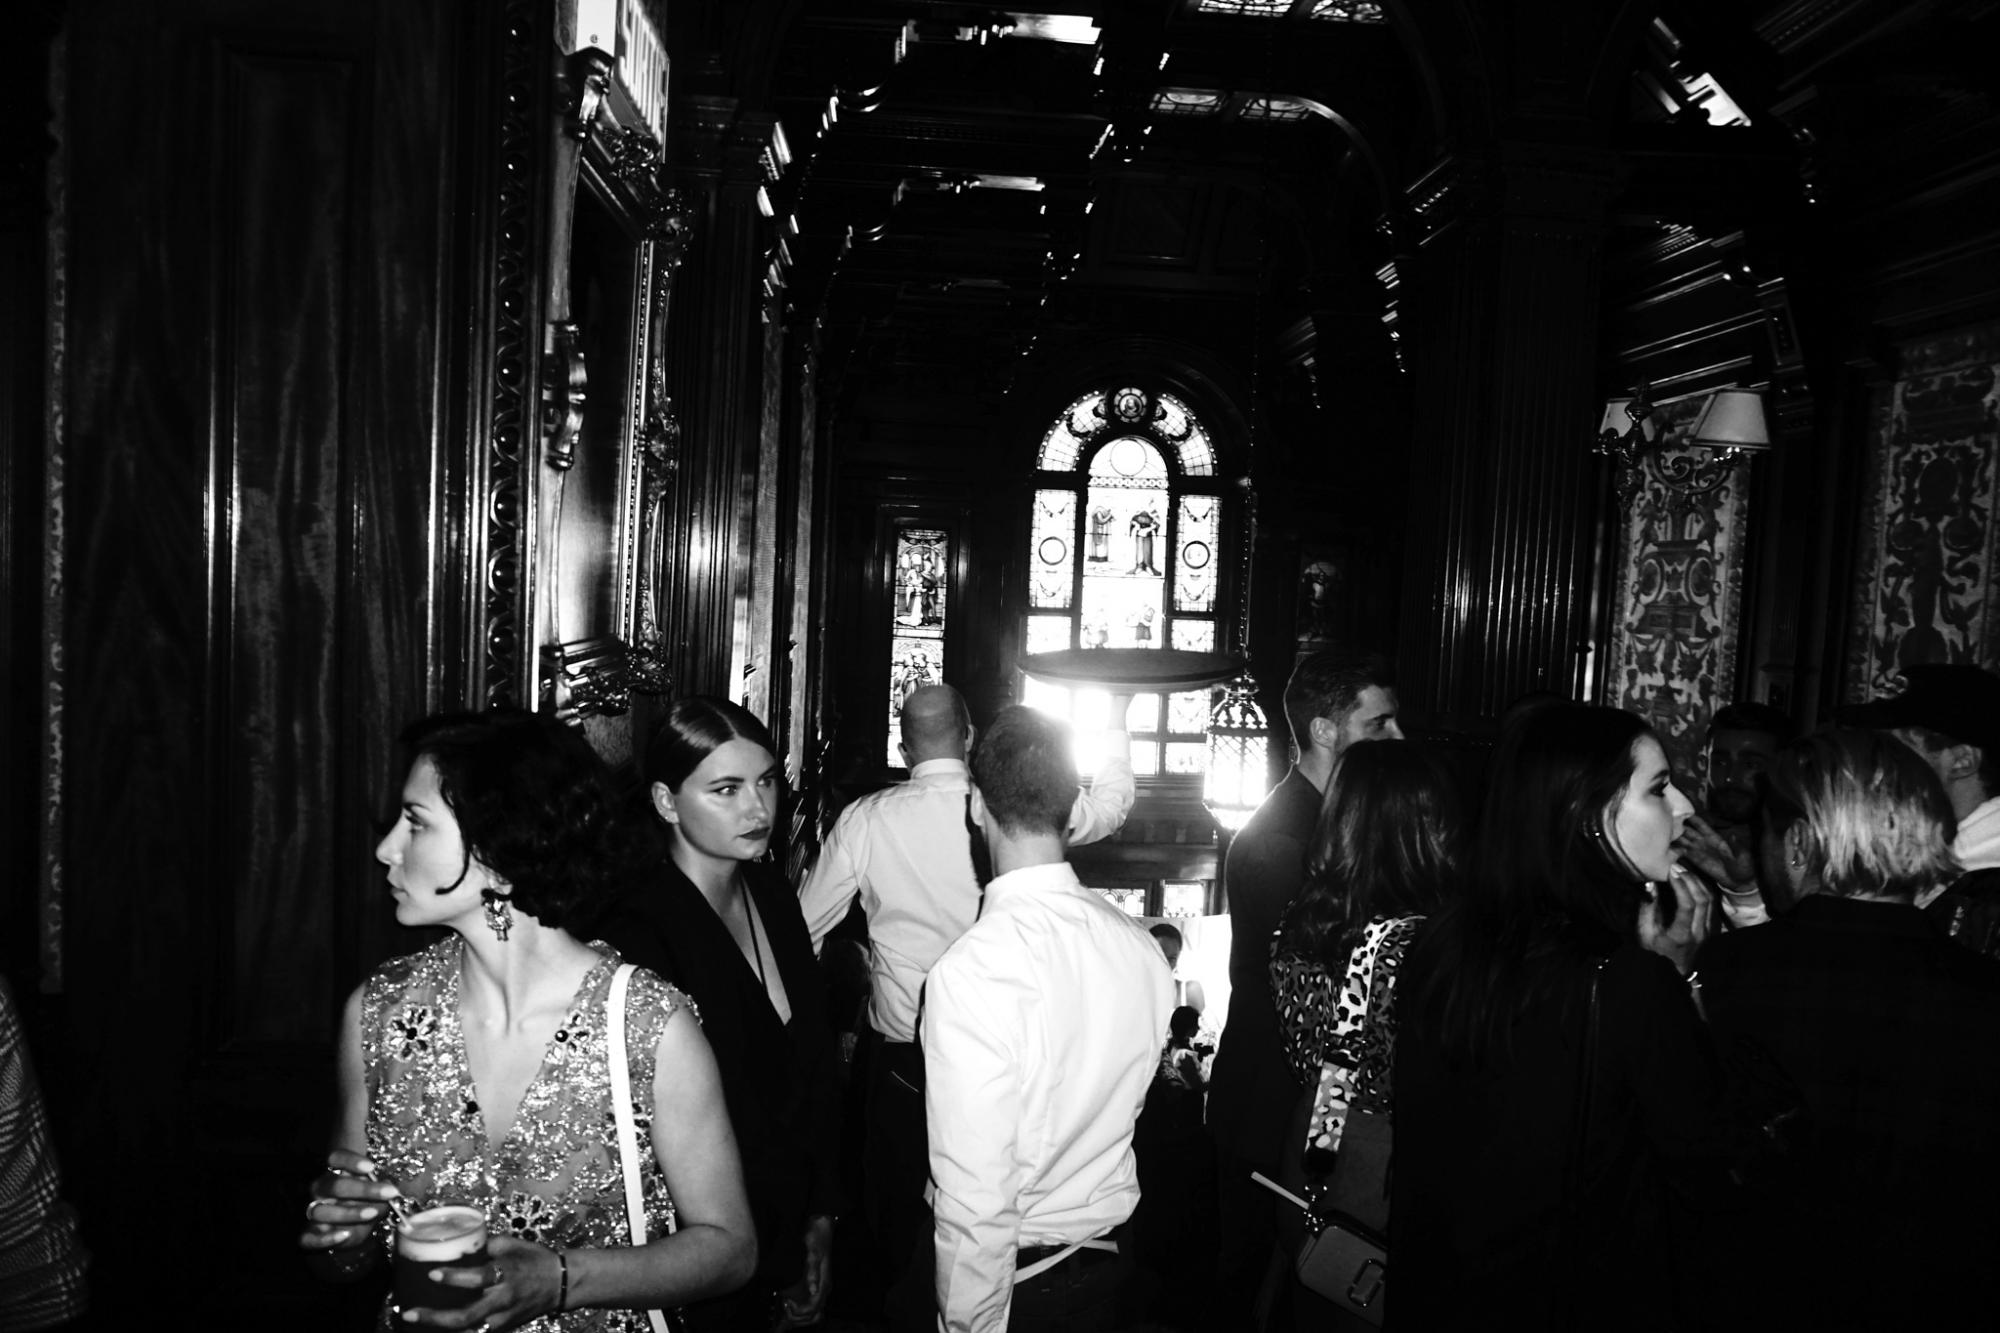 Dress to Kill - Bar George - Grand Prix - Event - Red Carpet - VIP - Mansion - Manor